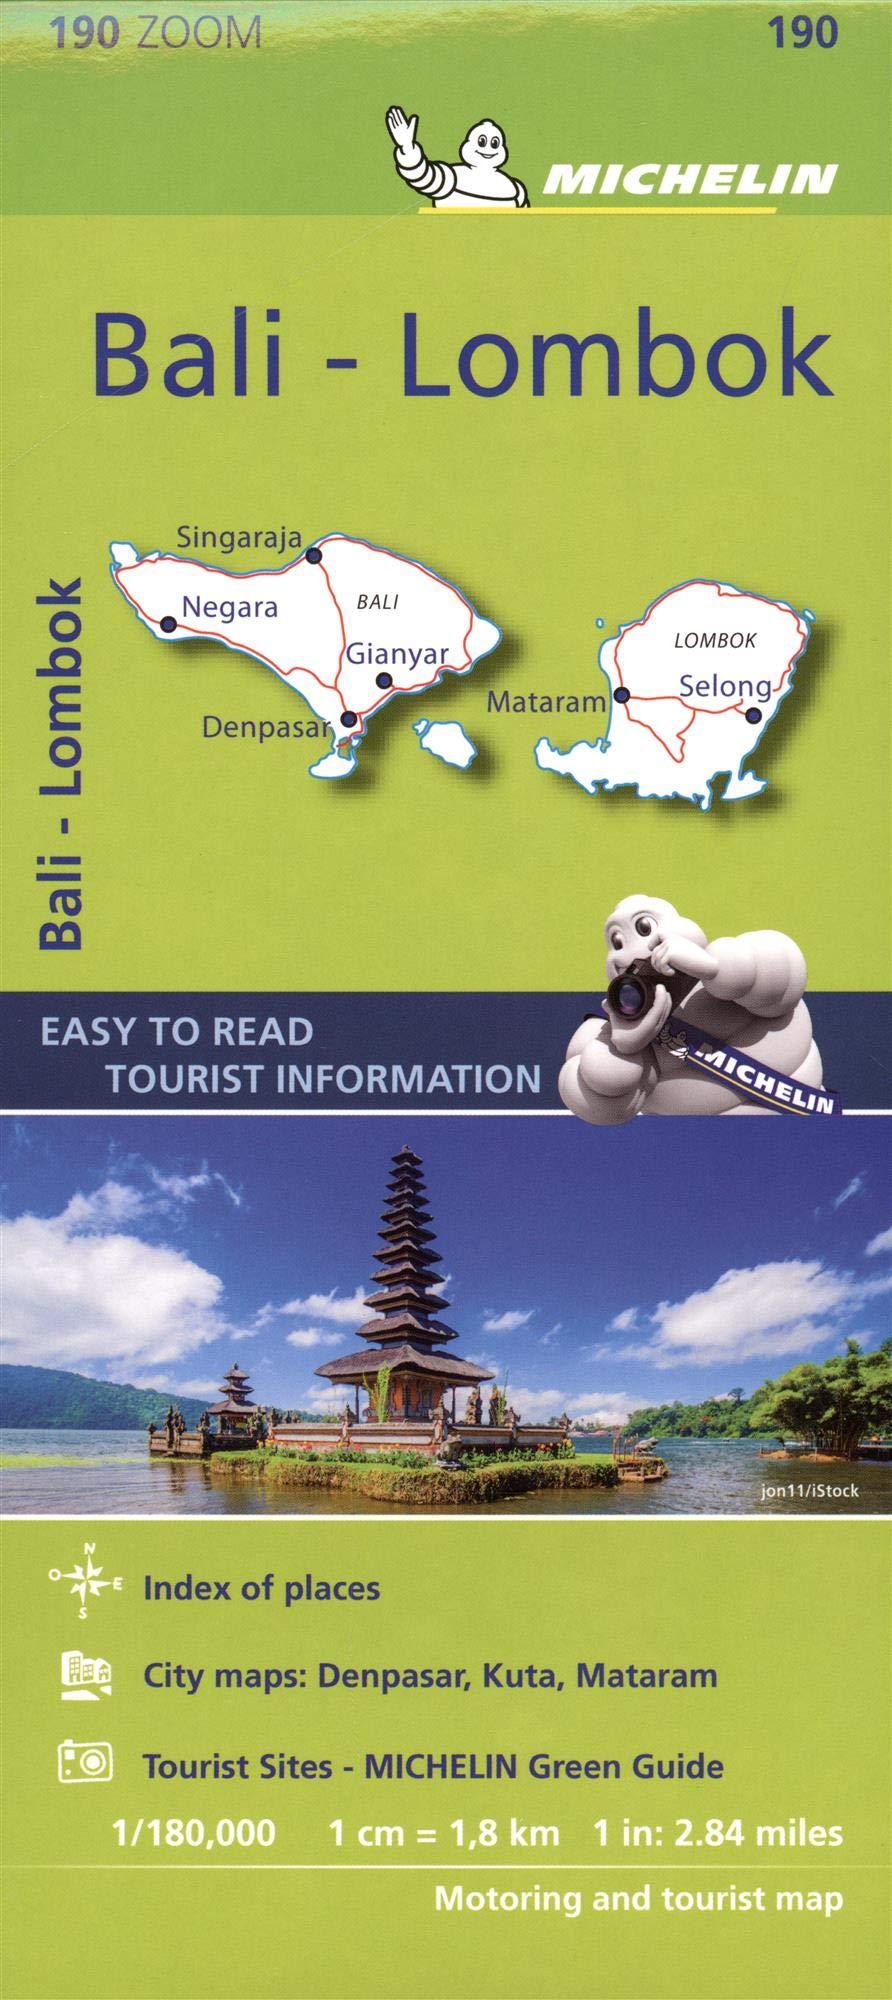 Mapa Zoom Bali-Lombok (Mapa Zoom Michelin)